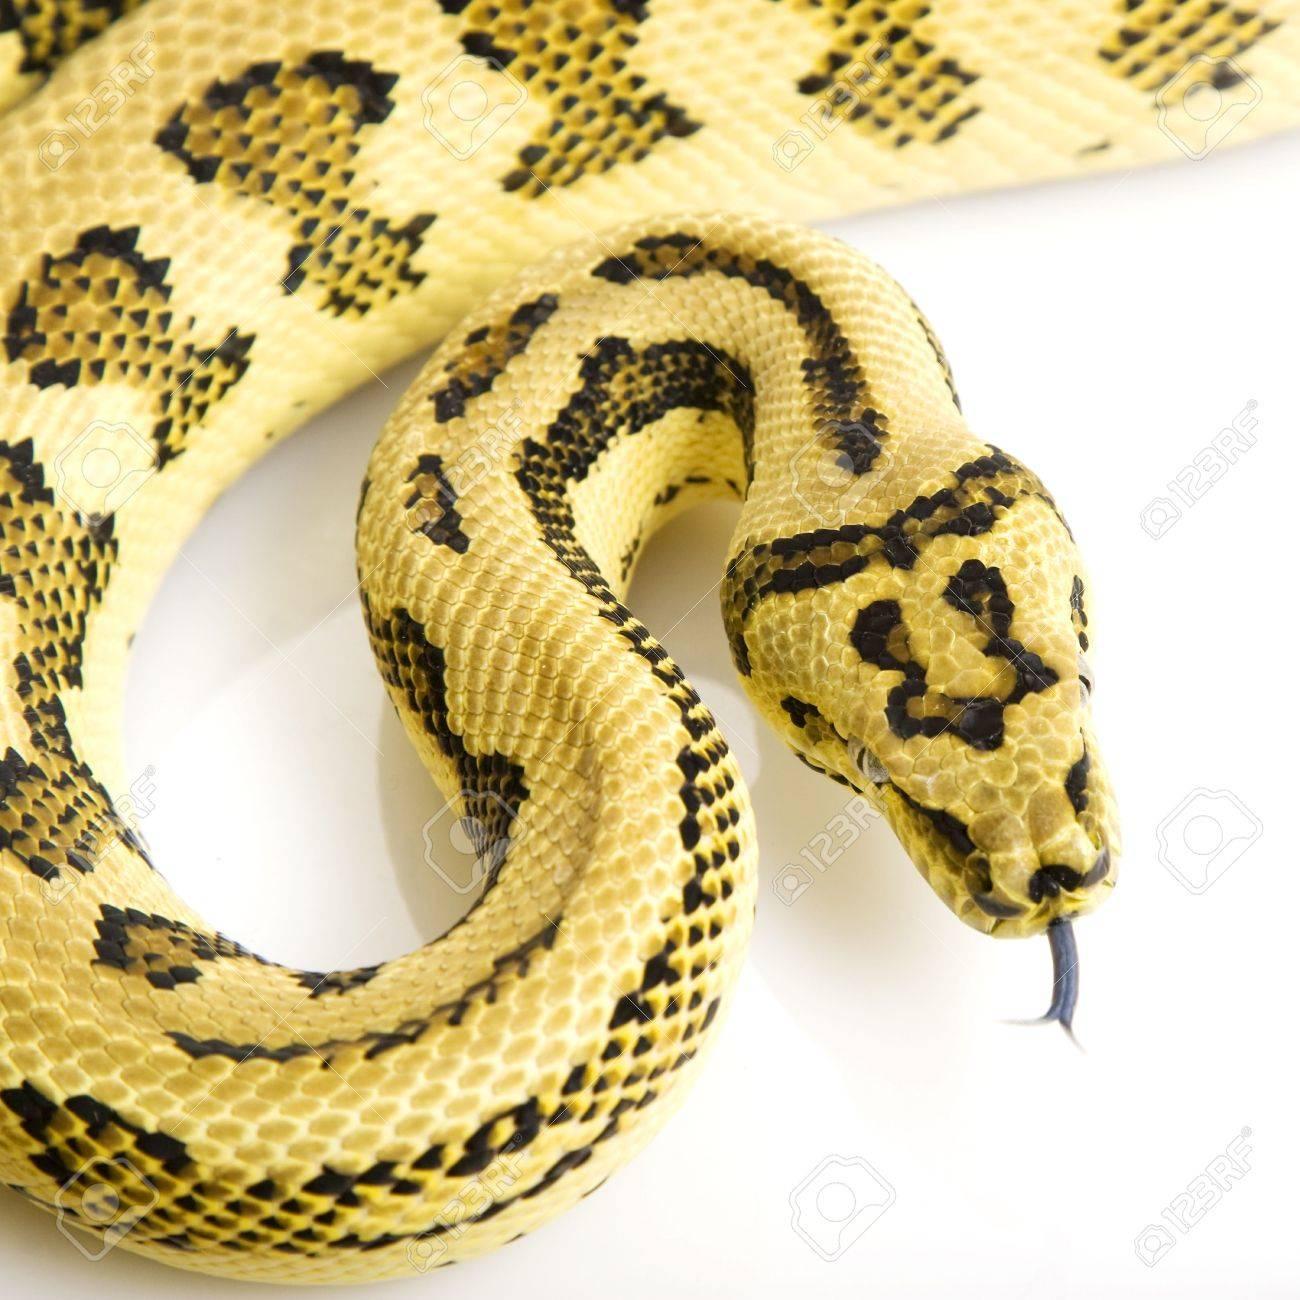 Jungle Jaguar Carpet Python (Morelia spilota variegata) on white background. Stock Photo -